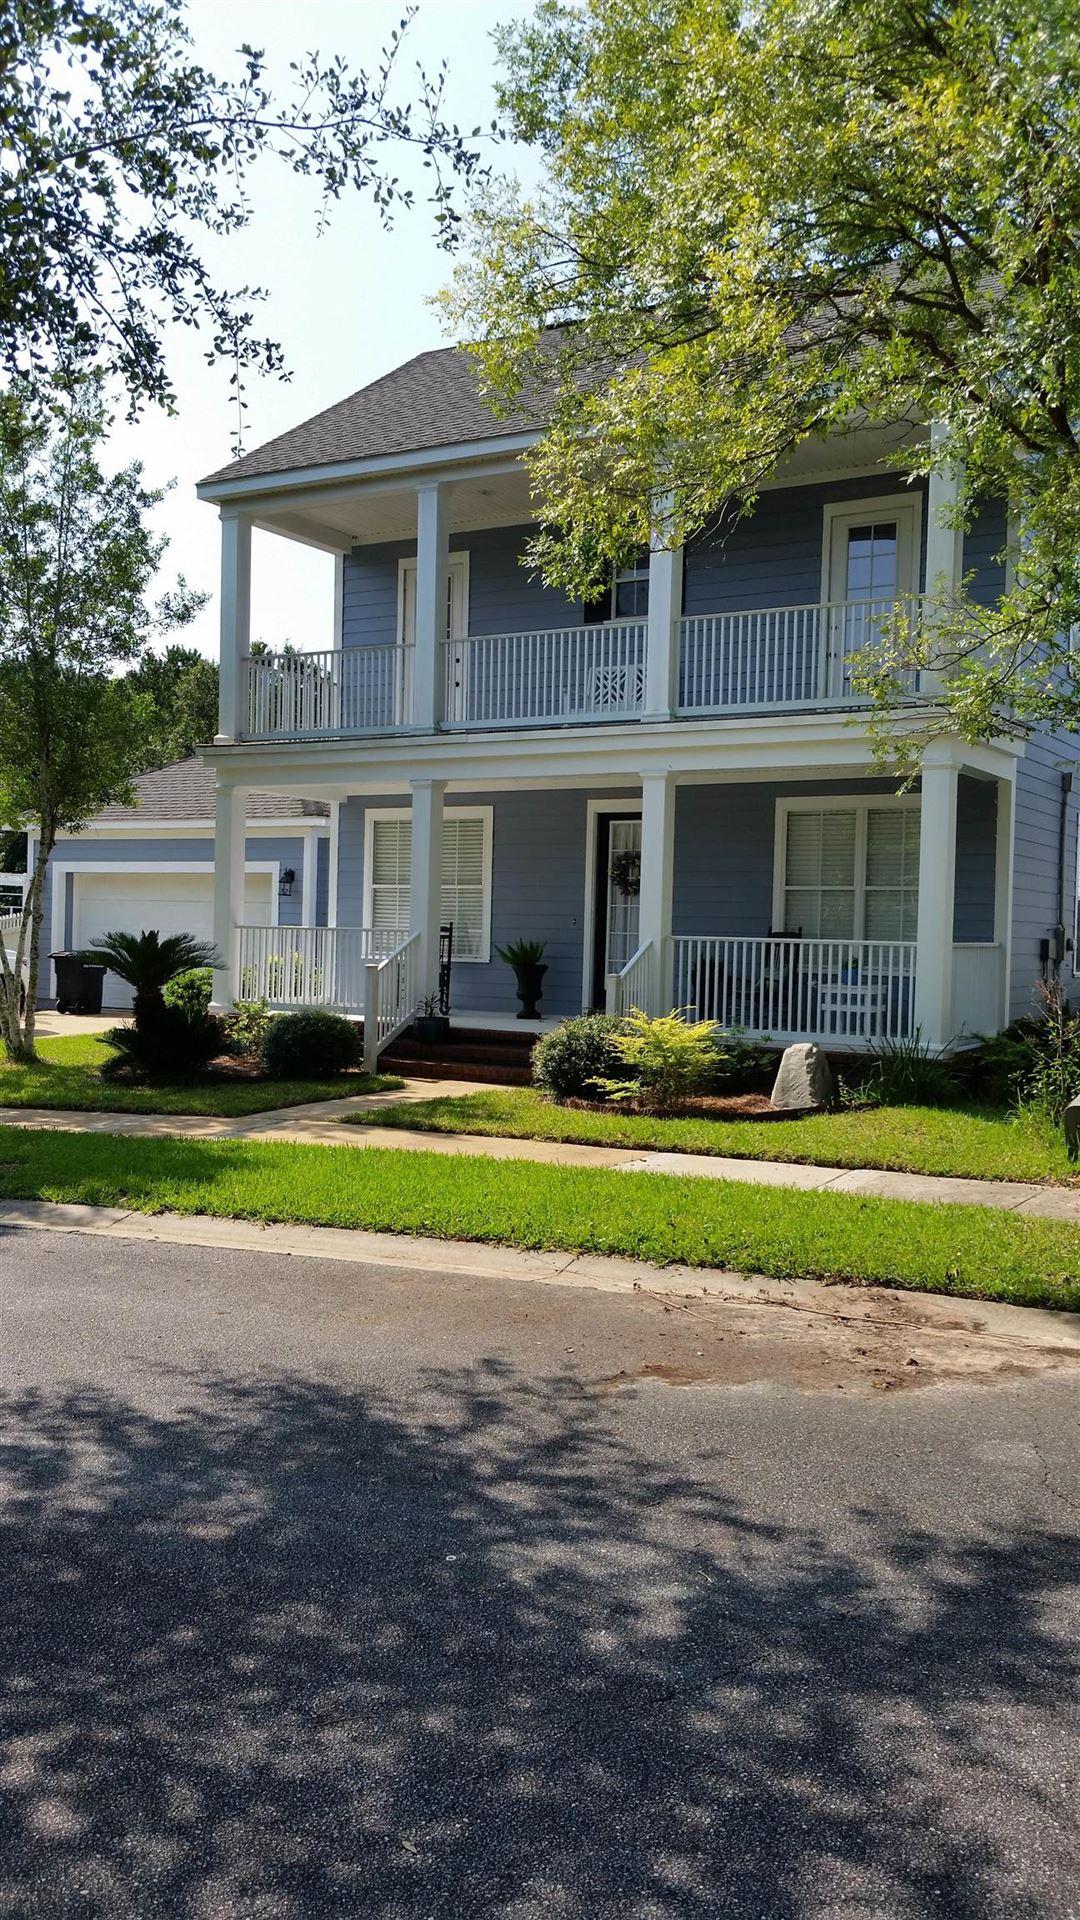 Photo of 3773 Overlook Drive, TALLAHASSEE, FL 32311 (MLS # 337589)